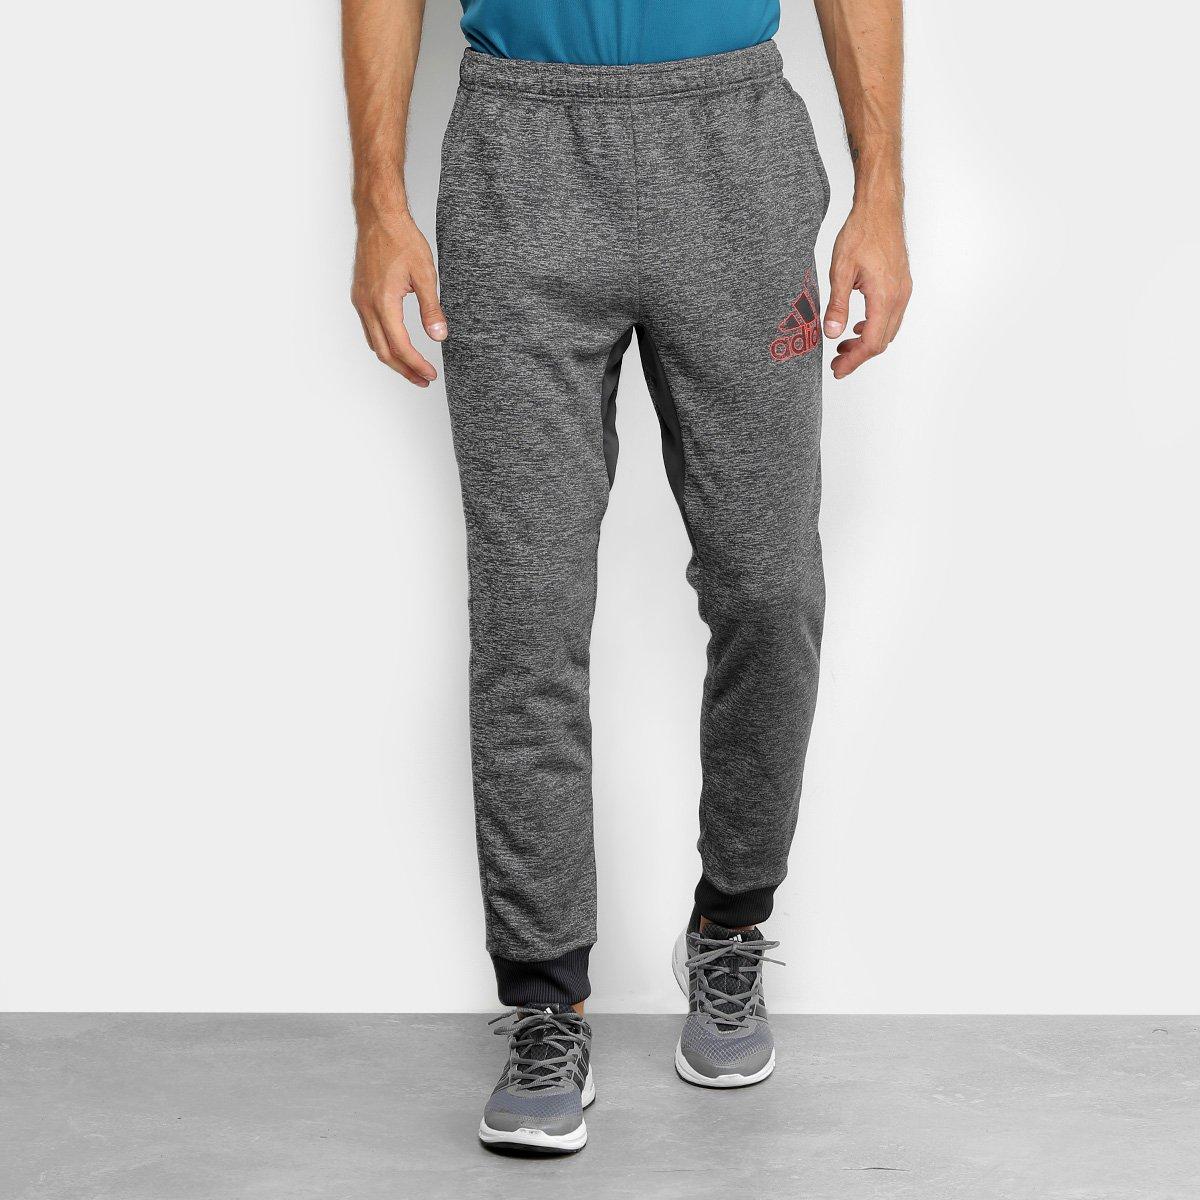 94cfbe0ab Calça Adidas Generalista Masculina - Preto | Allianz Parque Shop